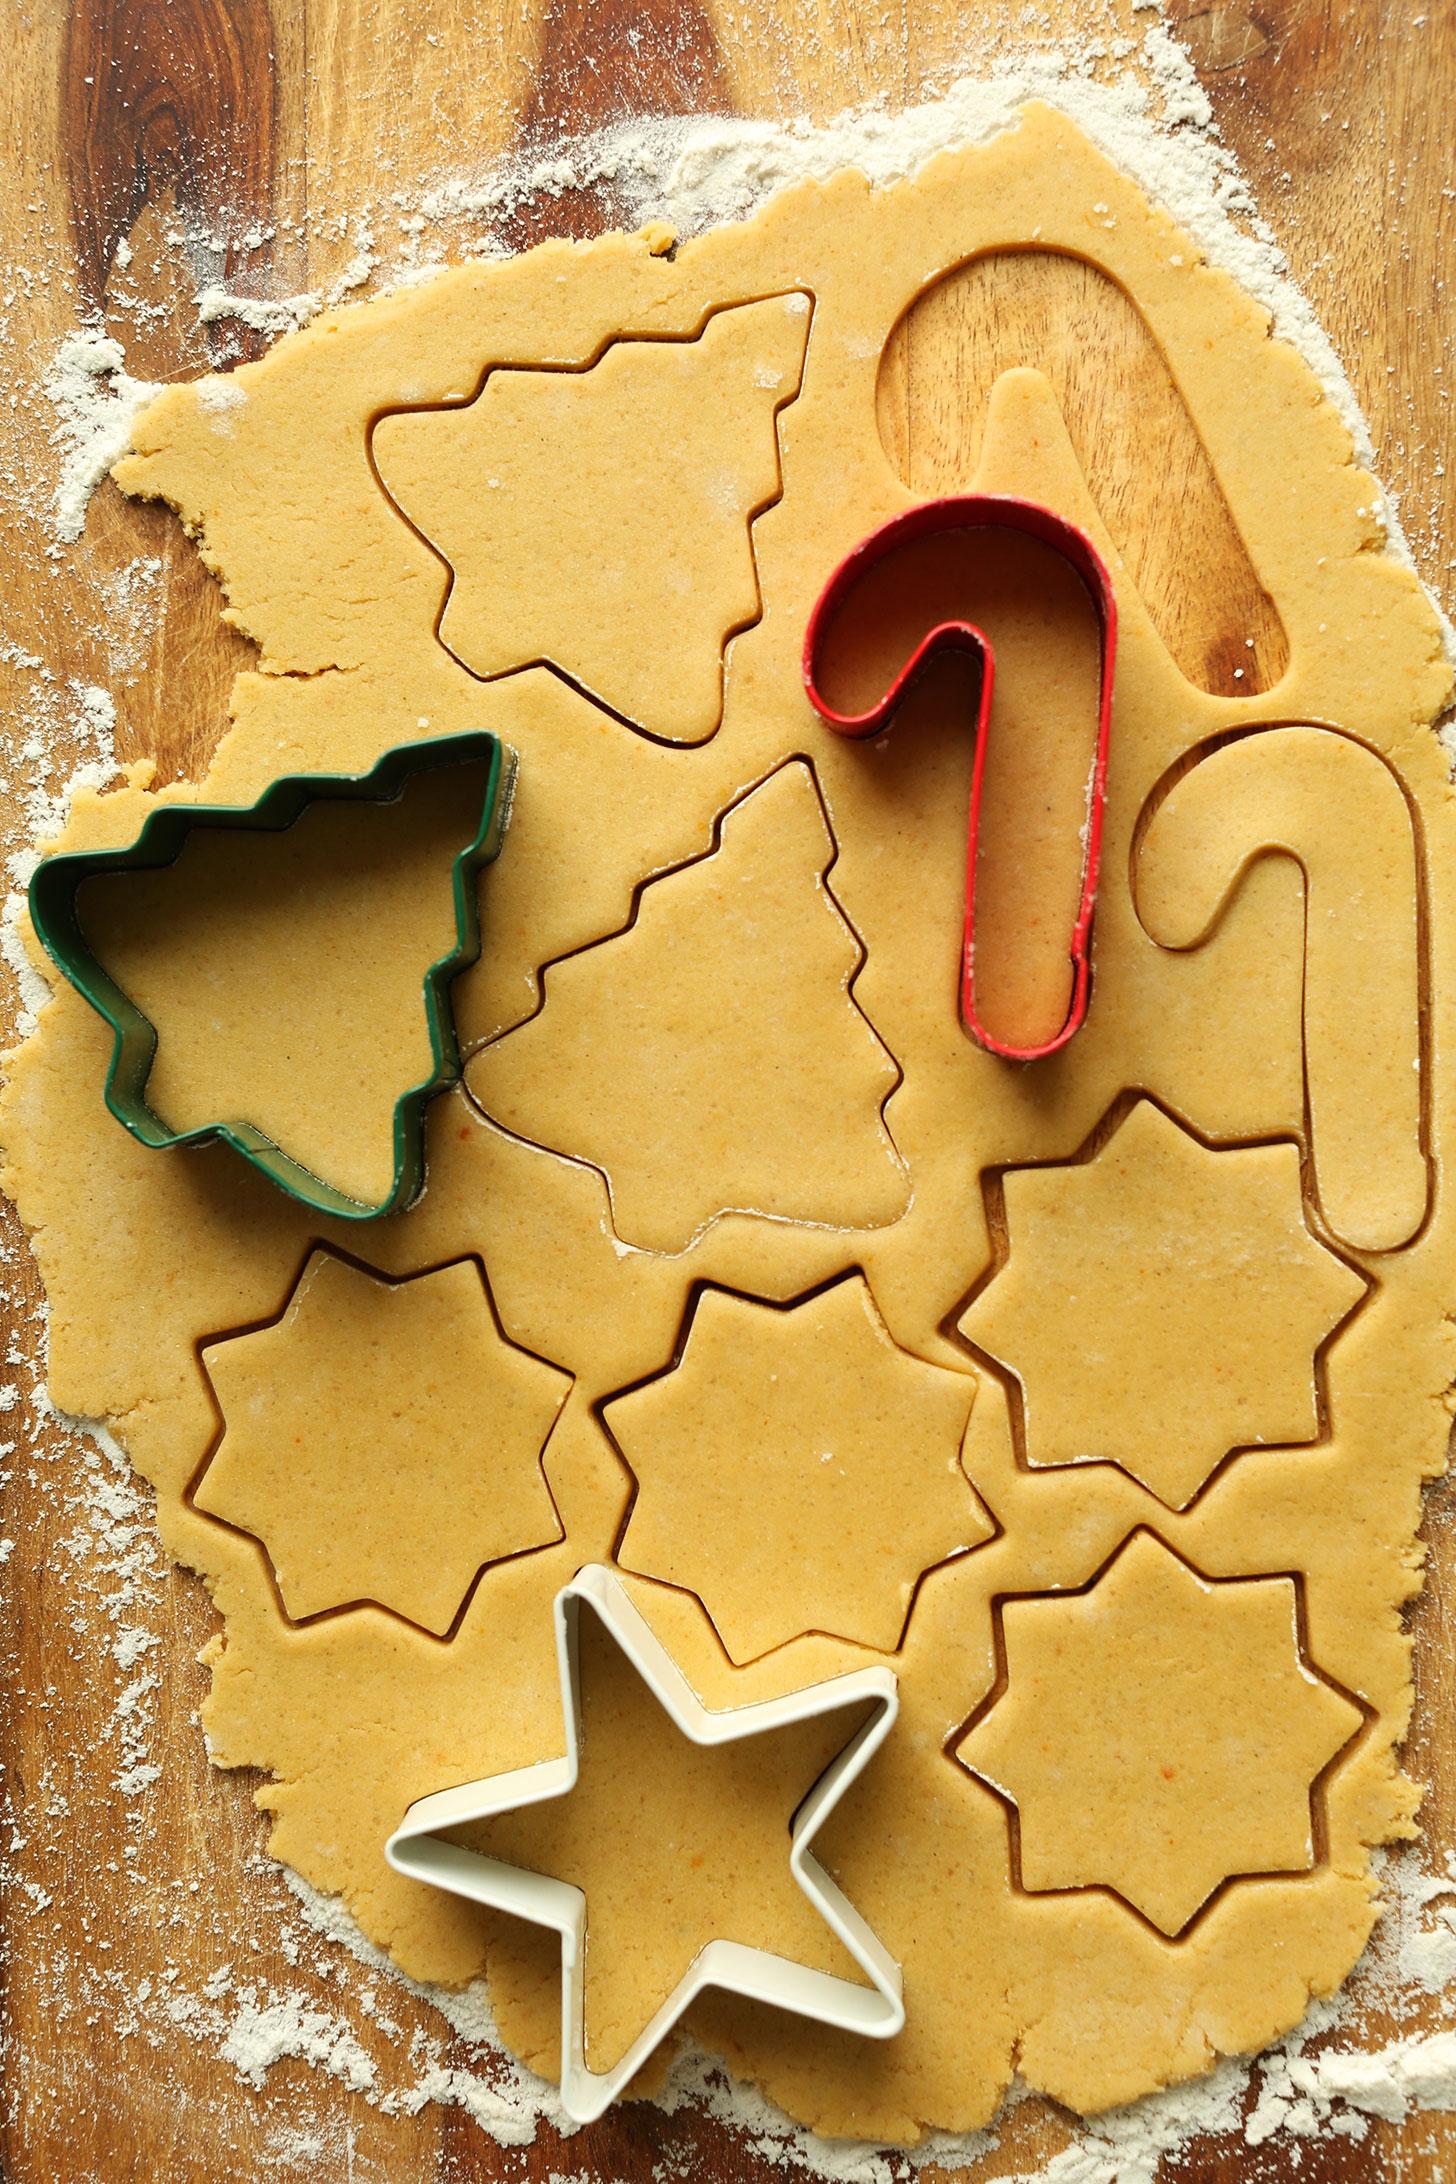 EASY 1-Bowl Gluten-Free Sugar Cookies! Slightly crisp, perfectly sweet #vegan #glutenfree #cookies #dessert #minimalistbaker